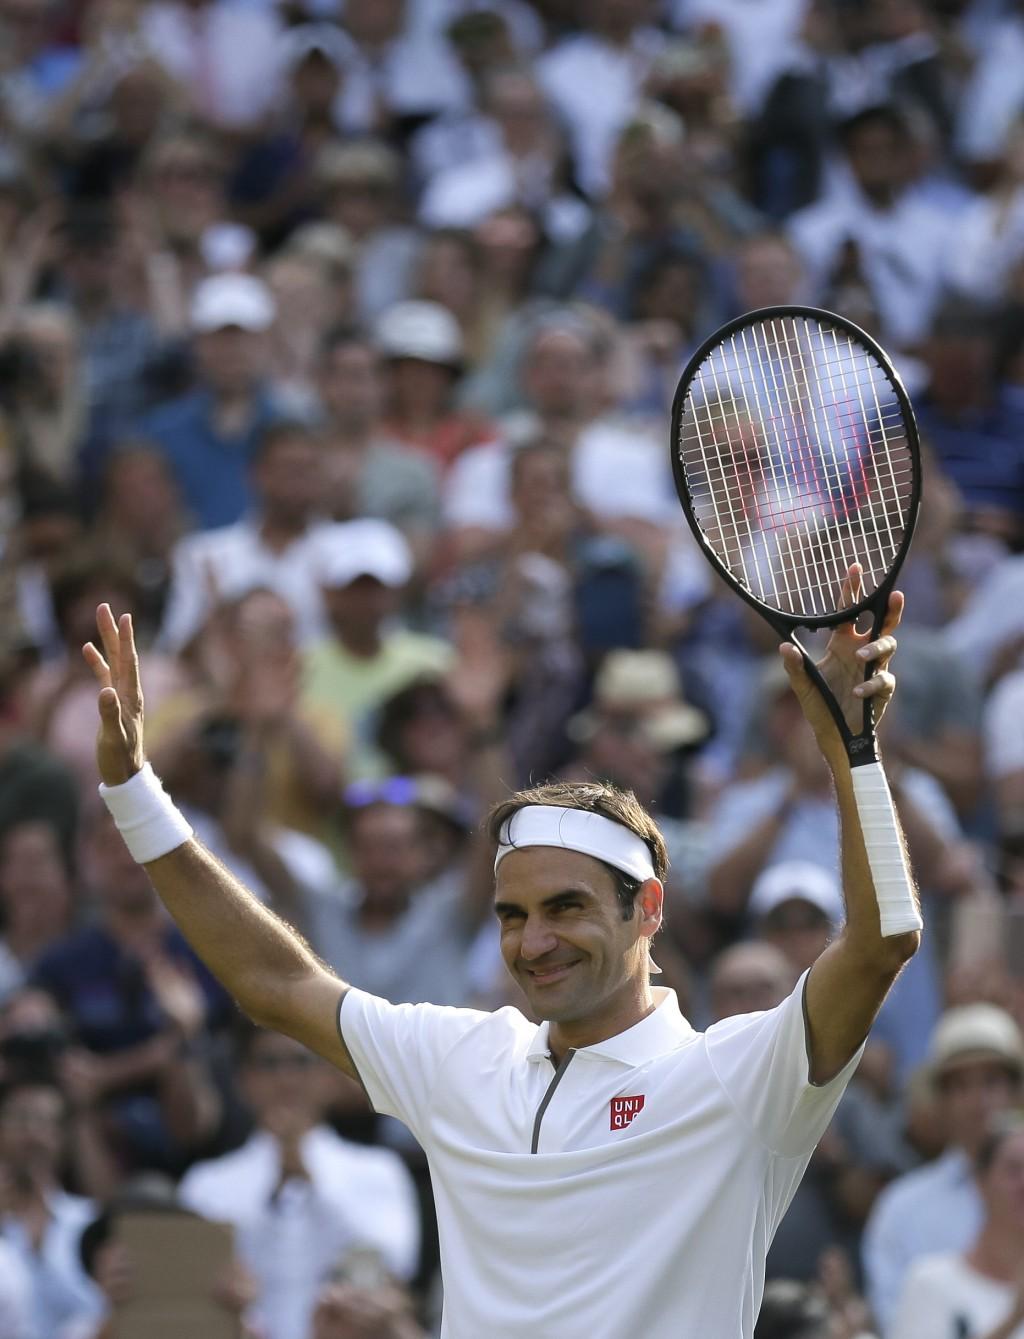 Switzerland's Roger Federer celebrates defeating Japan's Kei Nishikori during a men's quarterfinal match on day nine of the Wimbledon Tennis Champions